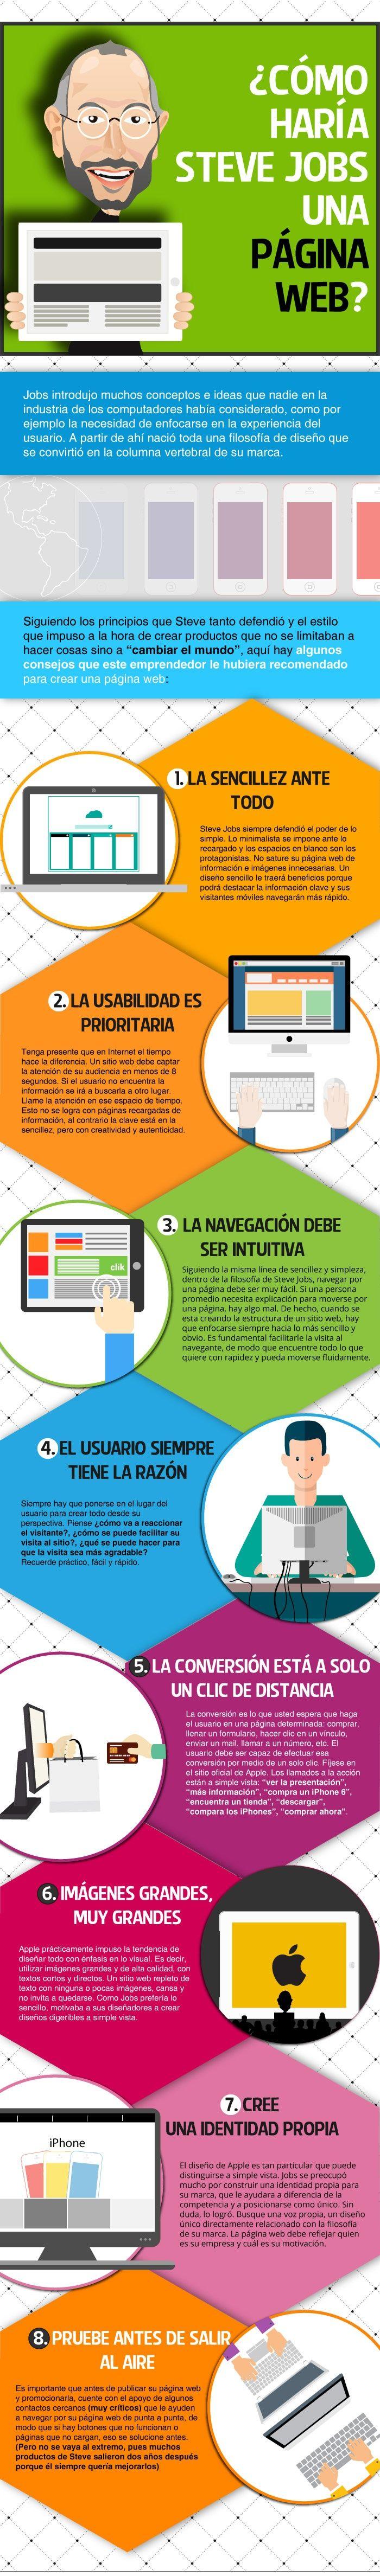 steve-jobs-pagina-web-infografia